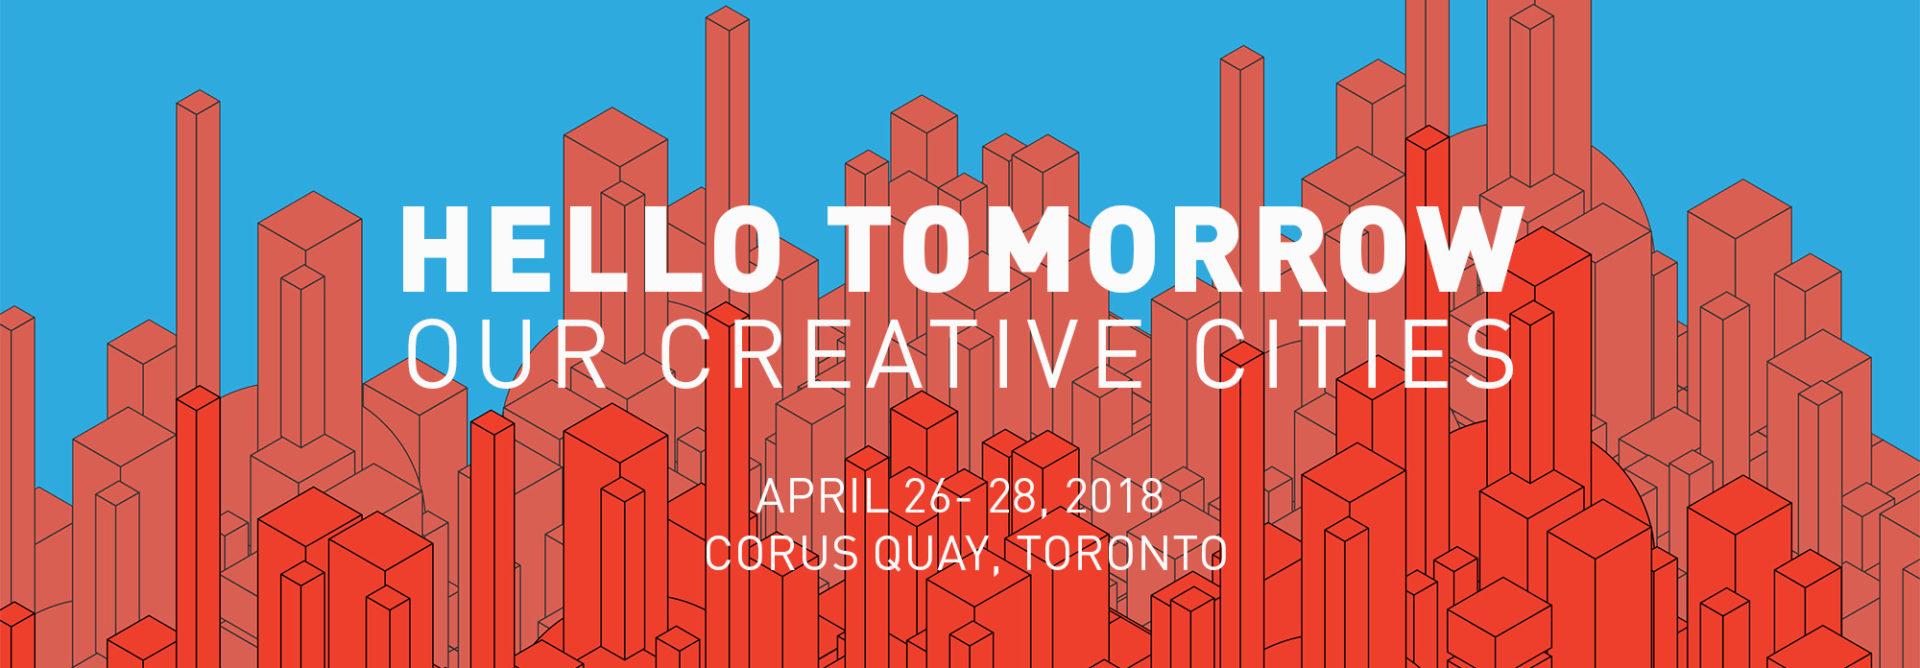 DIGIFEST 2018 @ Corus Quay | Toronto | Ontario | Canada